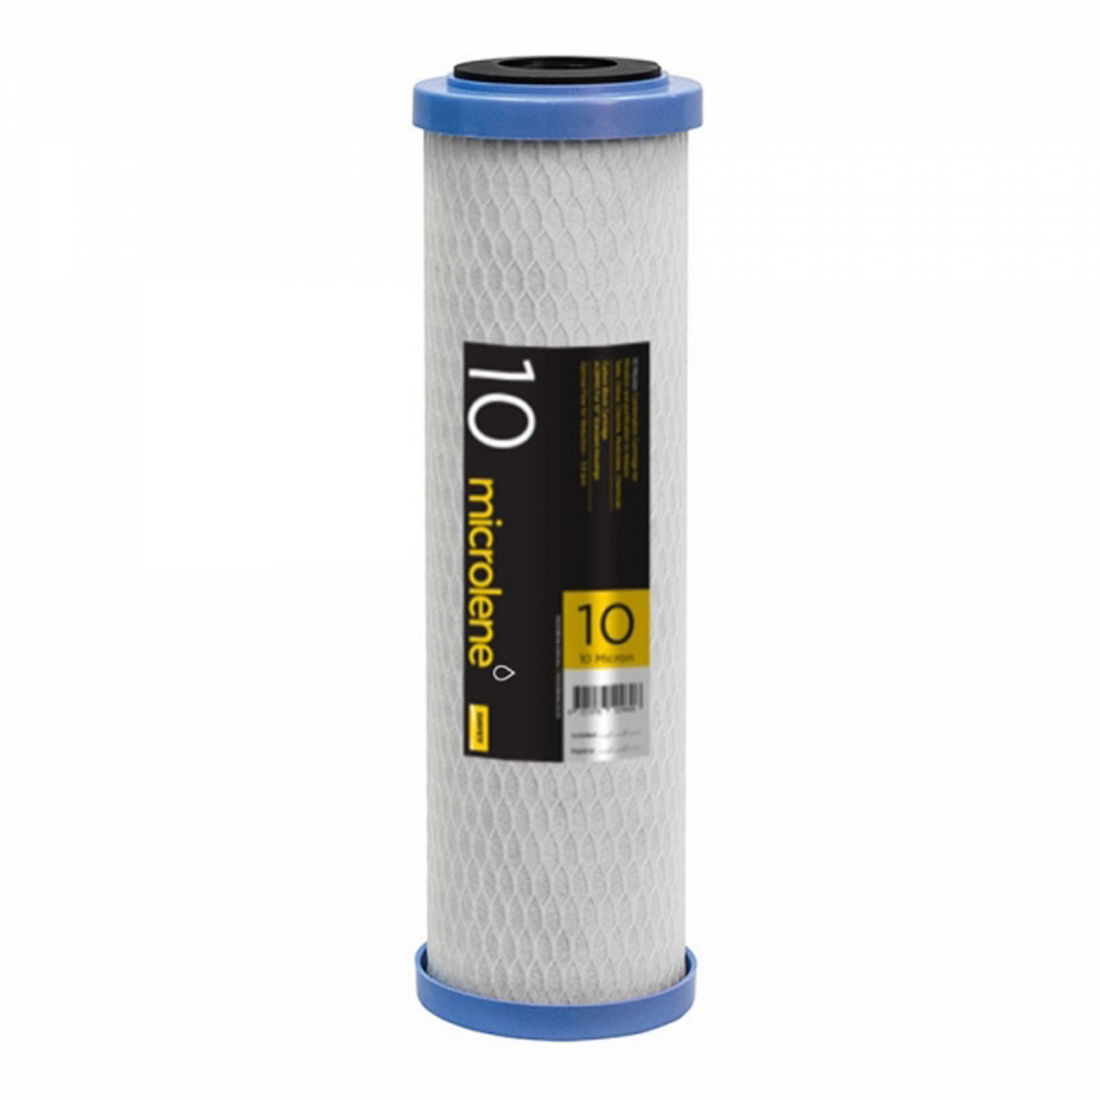 Davey Microlene Cartridge 4 l/min 1 micron BPAC10